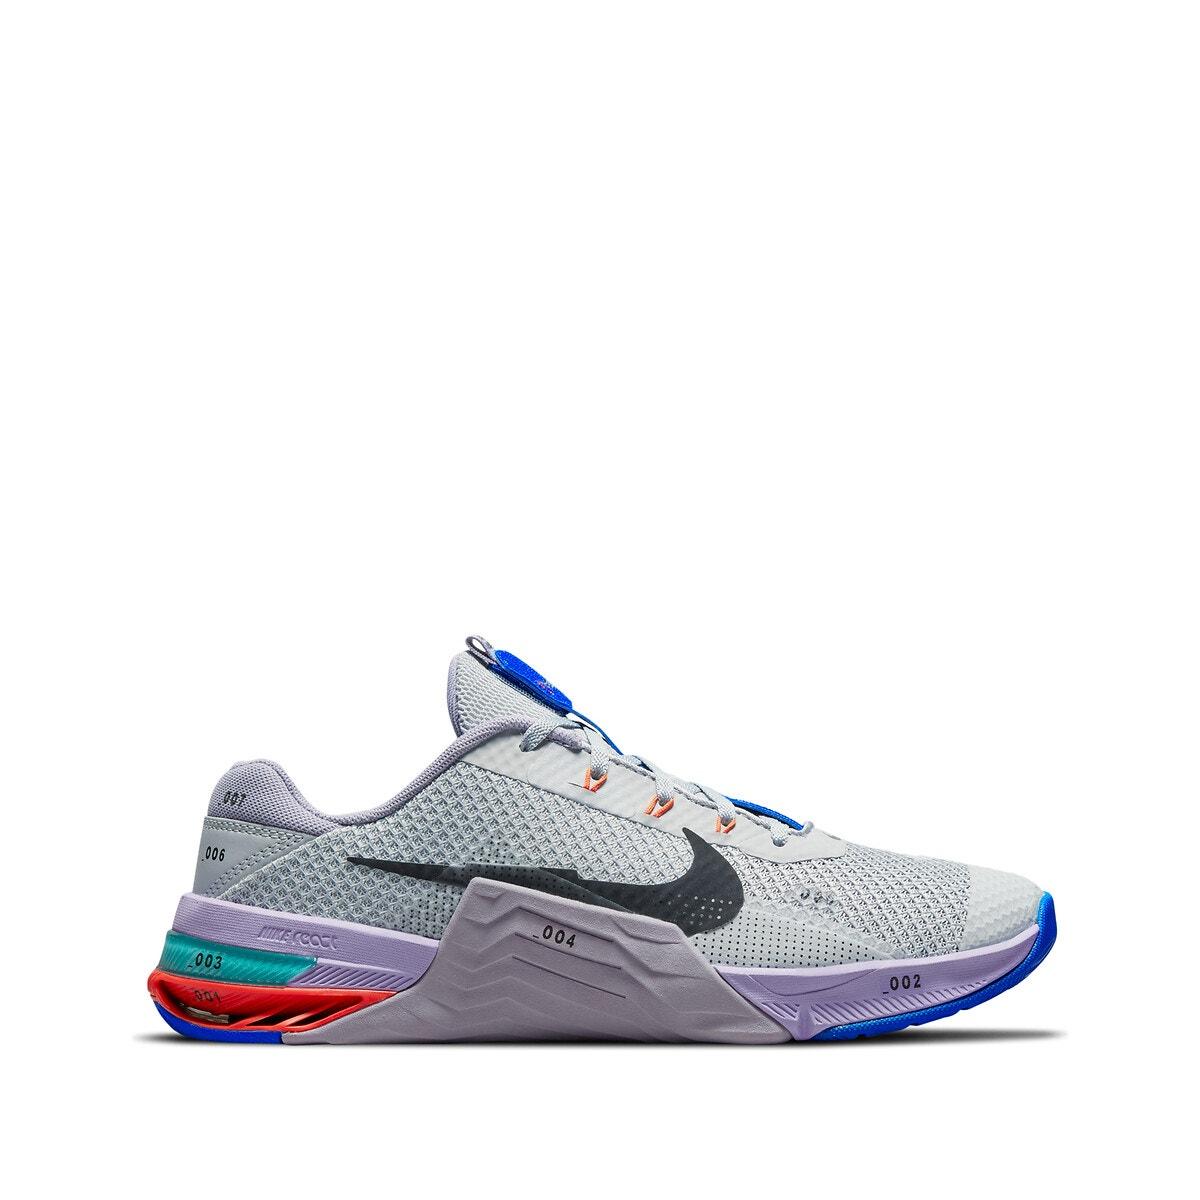 Nike toile homme   La Redoute